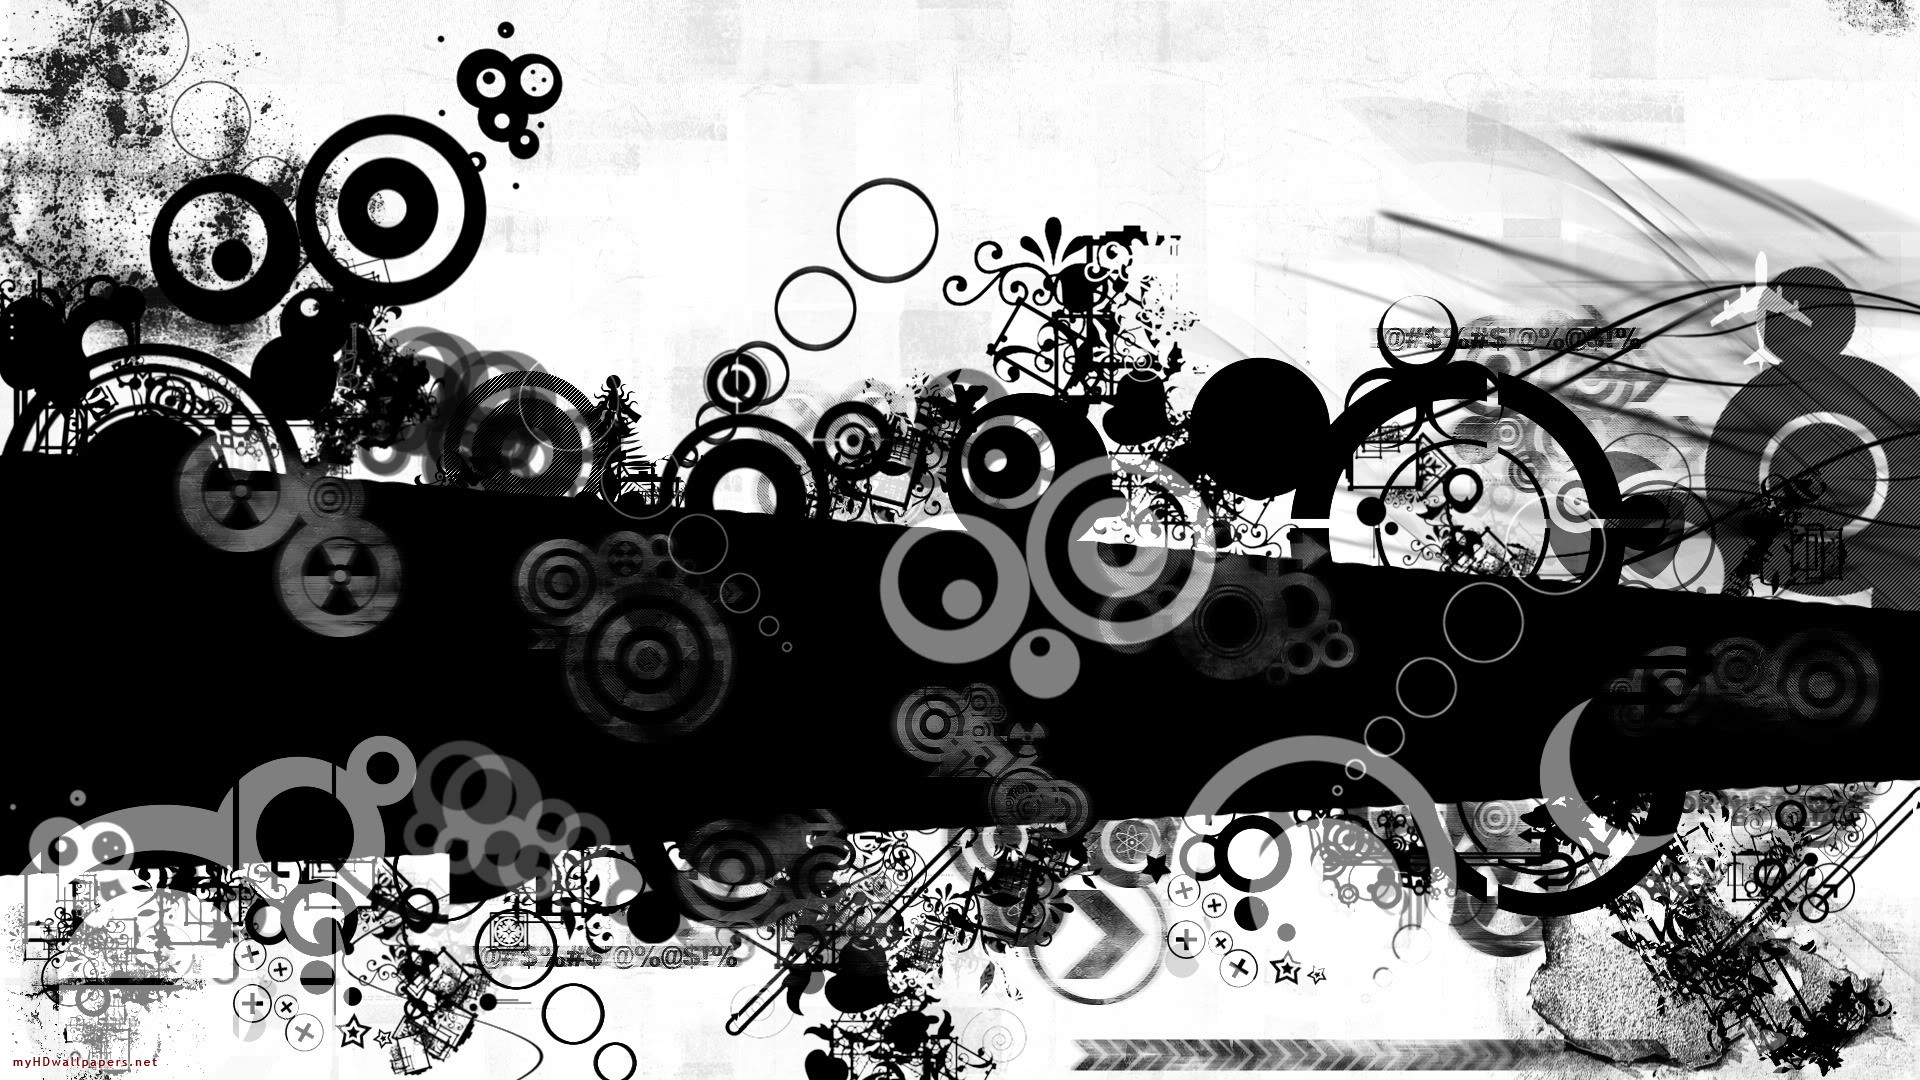 Black and white wallpaper clipart clip art black and white download Free Hd Black And White Wallpapers, Download Free Clip Art, Free ... clip art black and white download